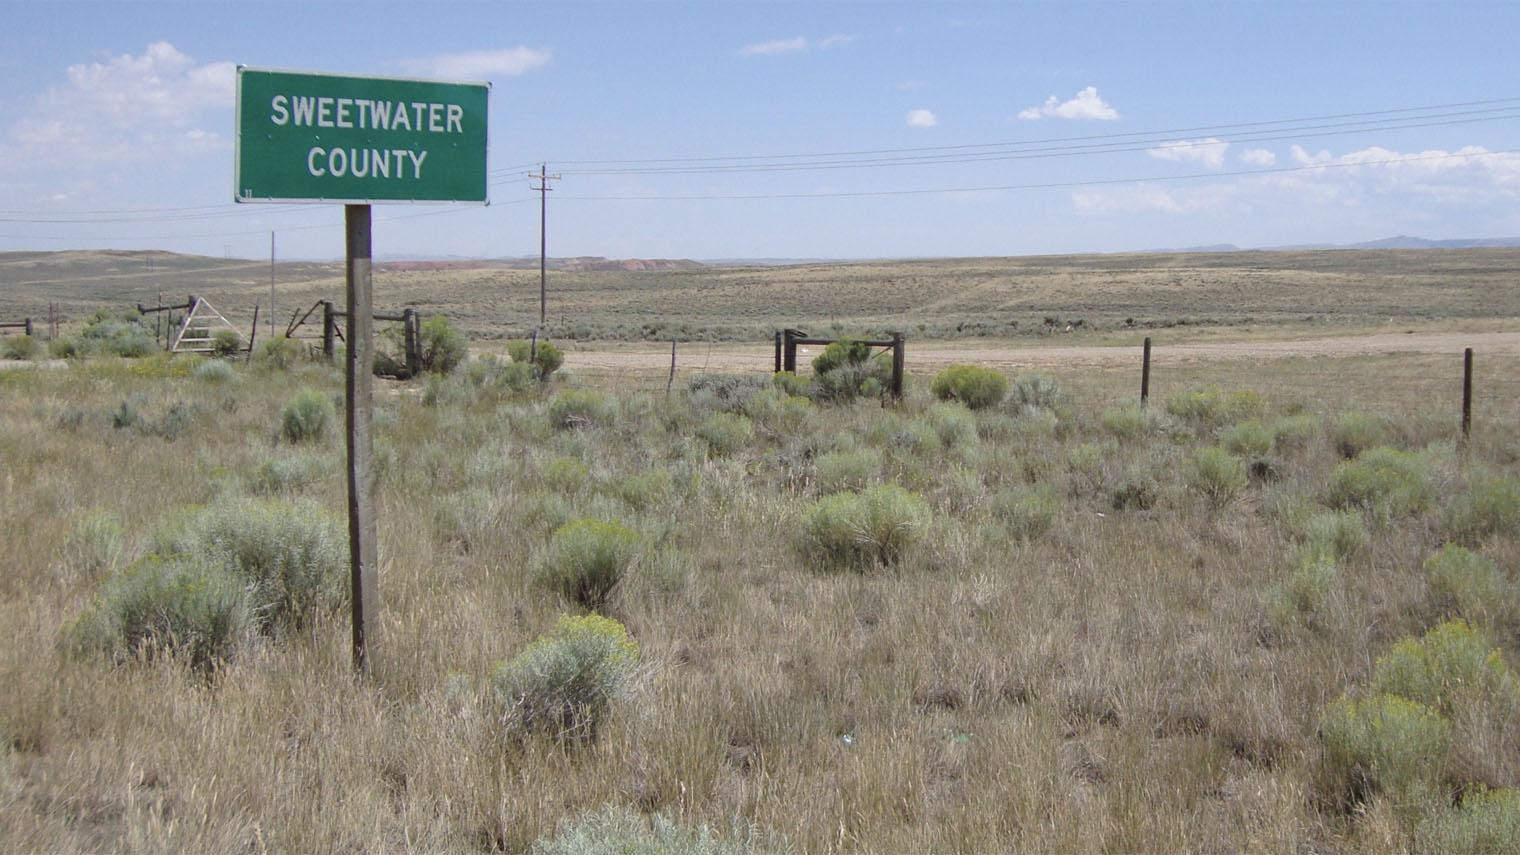 Sweetwater County Sex Trafficking Sting: Ex-Legislator Arrest Just Tip Of The Iceberg